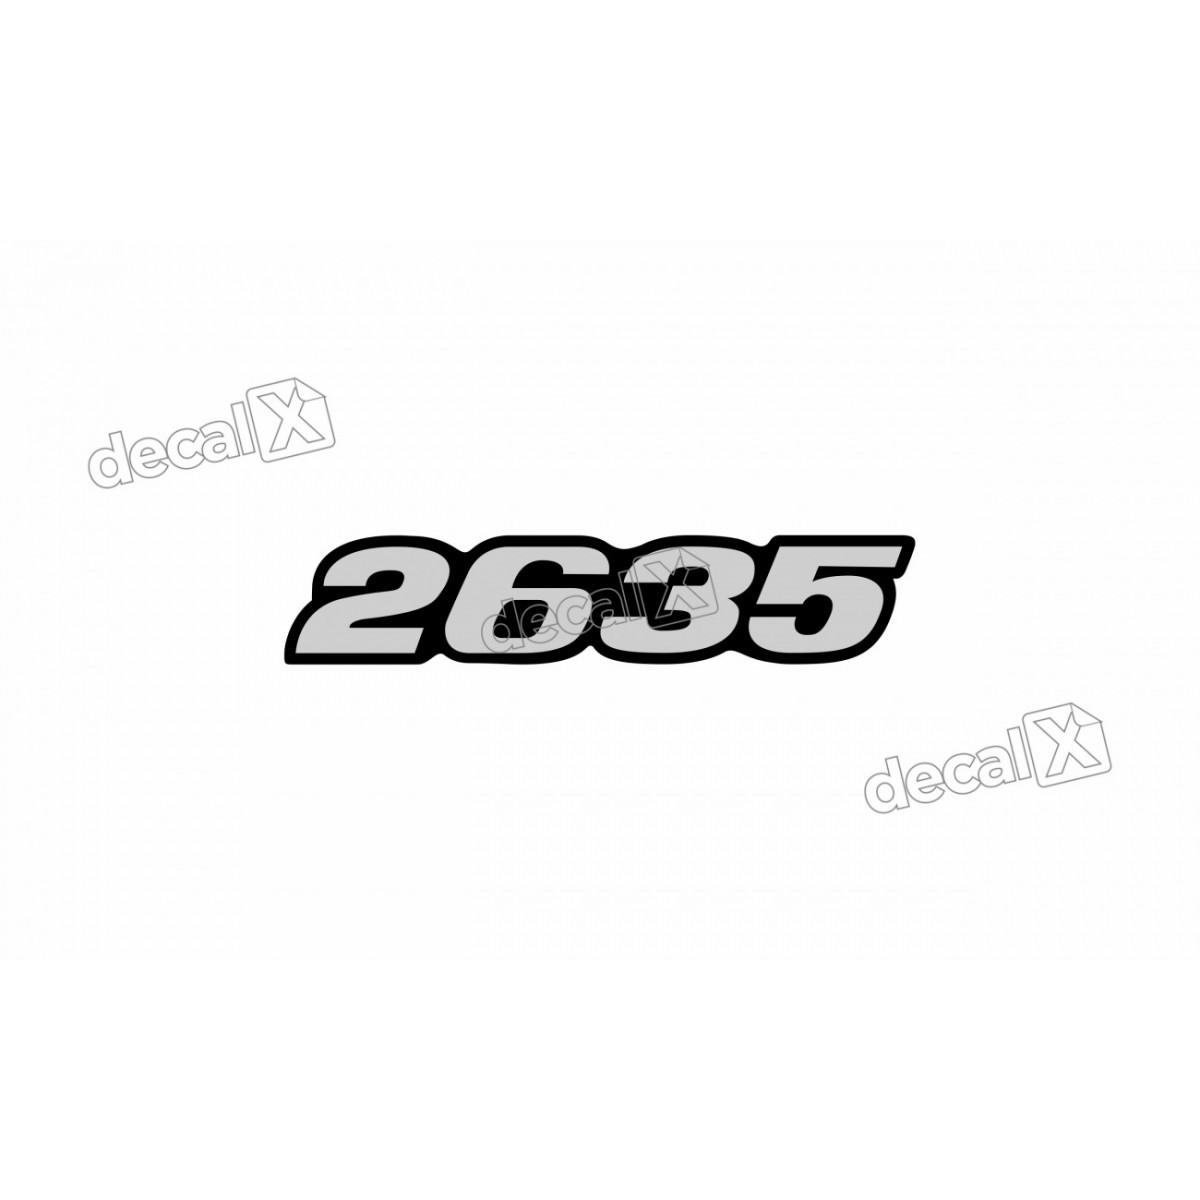 Adesivo Emblema Resinado Mercedes 2635 Cm88 Decalx